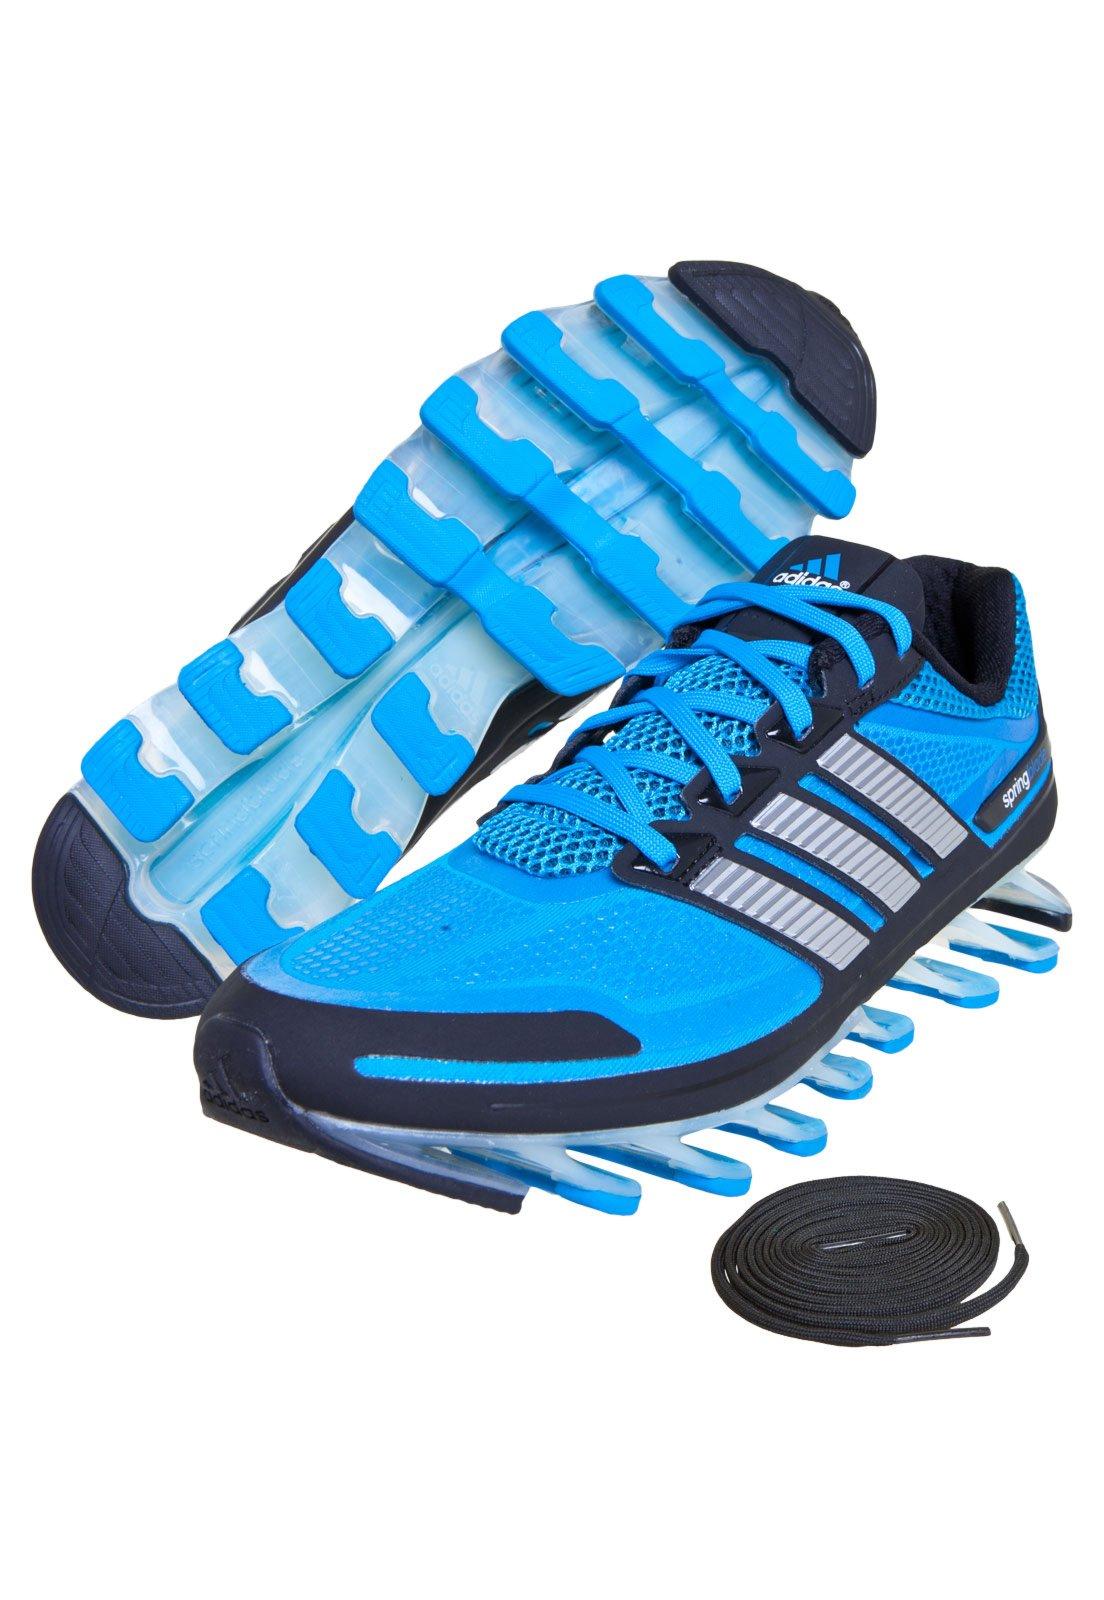 4766cba5fd6 ... coupon for adidas springblade azul branco 7439f 851f8